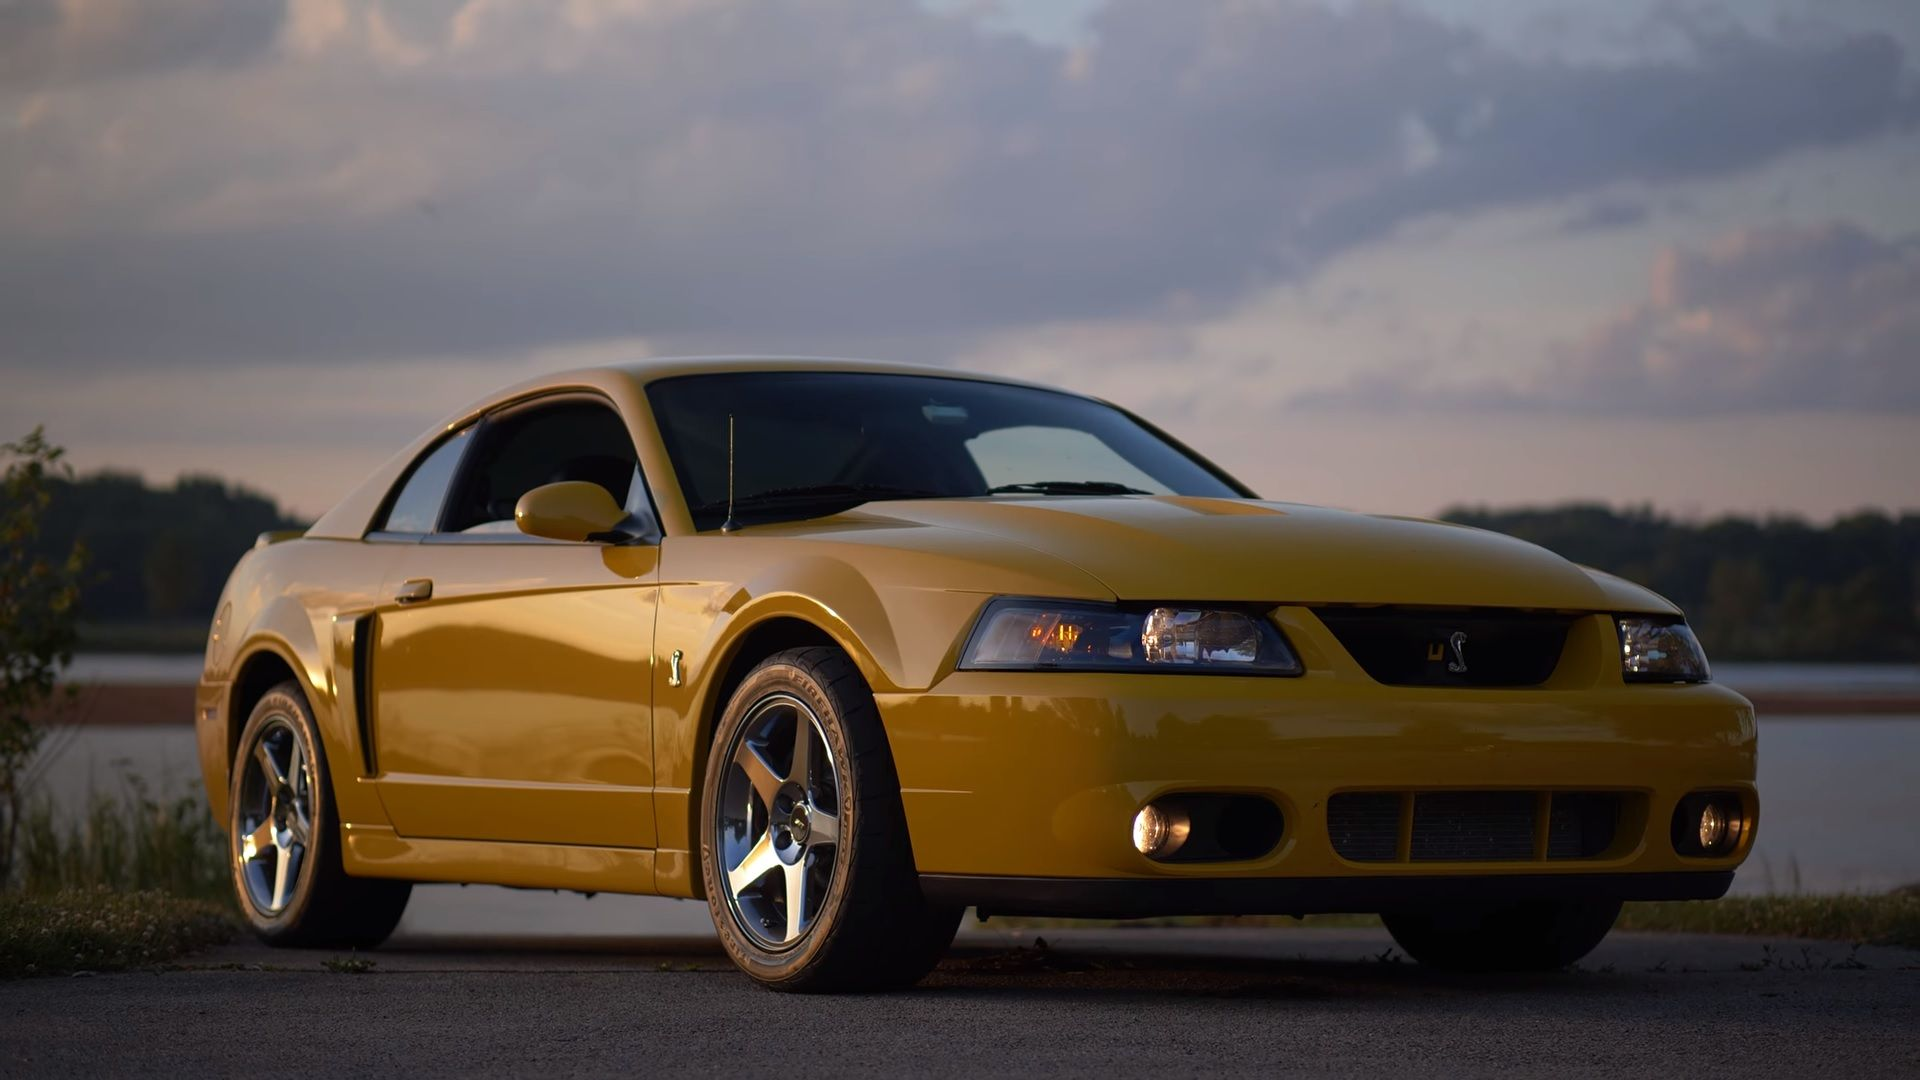 This 2003 2004 Svt Cobra Terminator Is The Car You Probably Forgot About Top Speed Svt Cobra Terminator Mustang Cobra Terminator